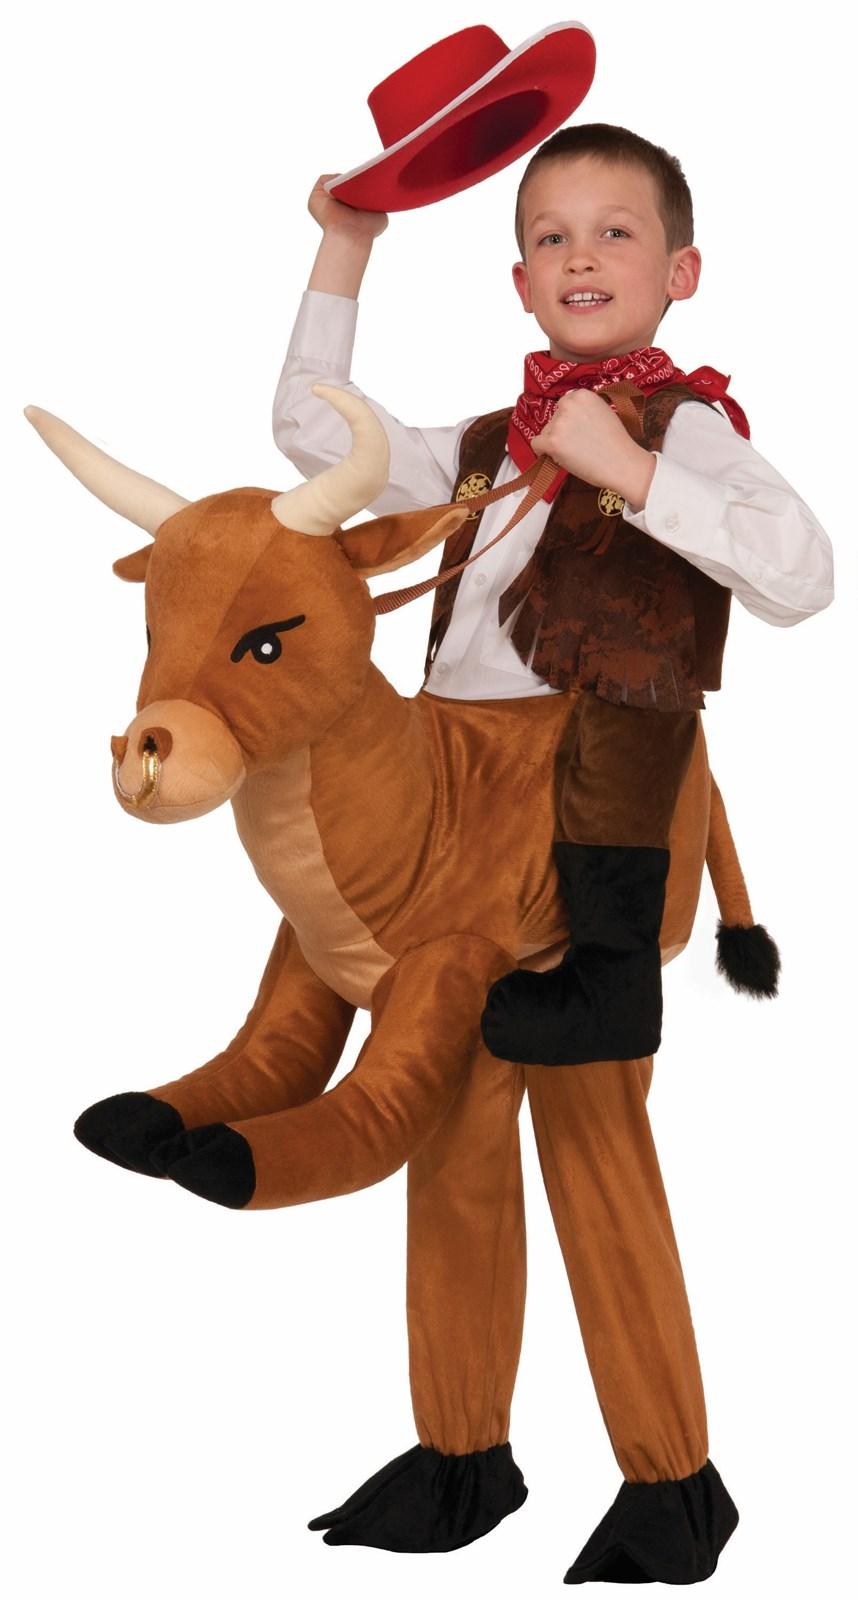 Ride on a Bull Costume for Children